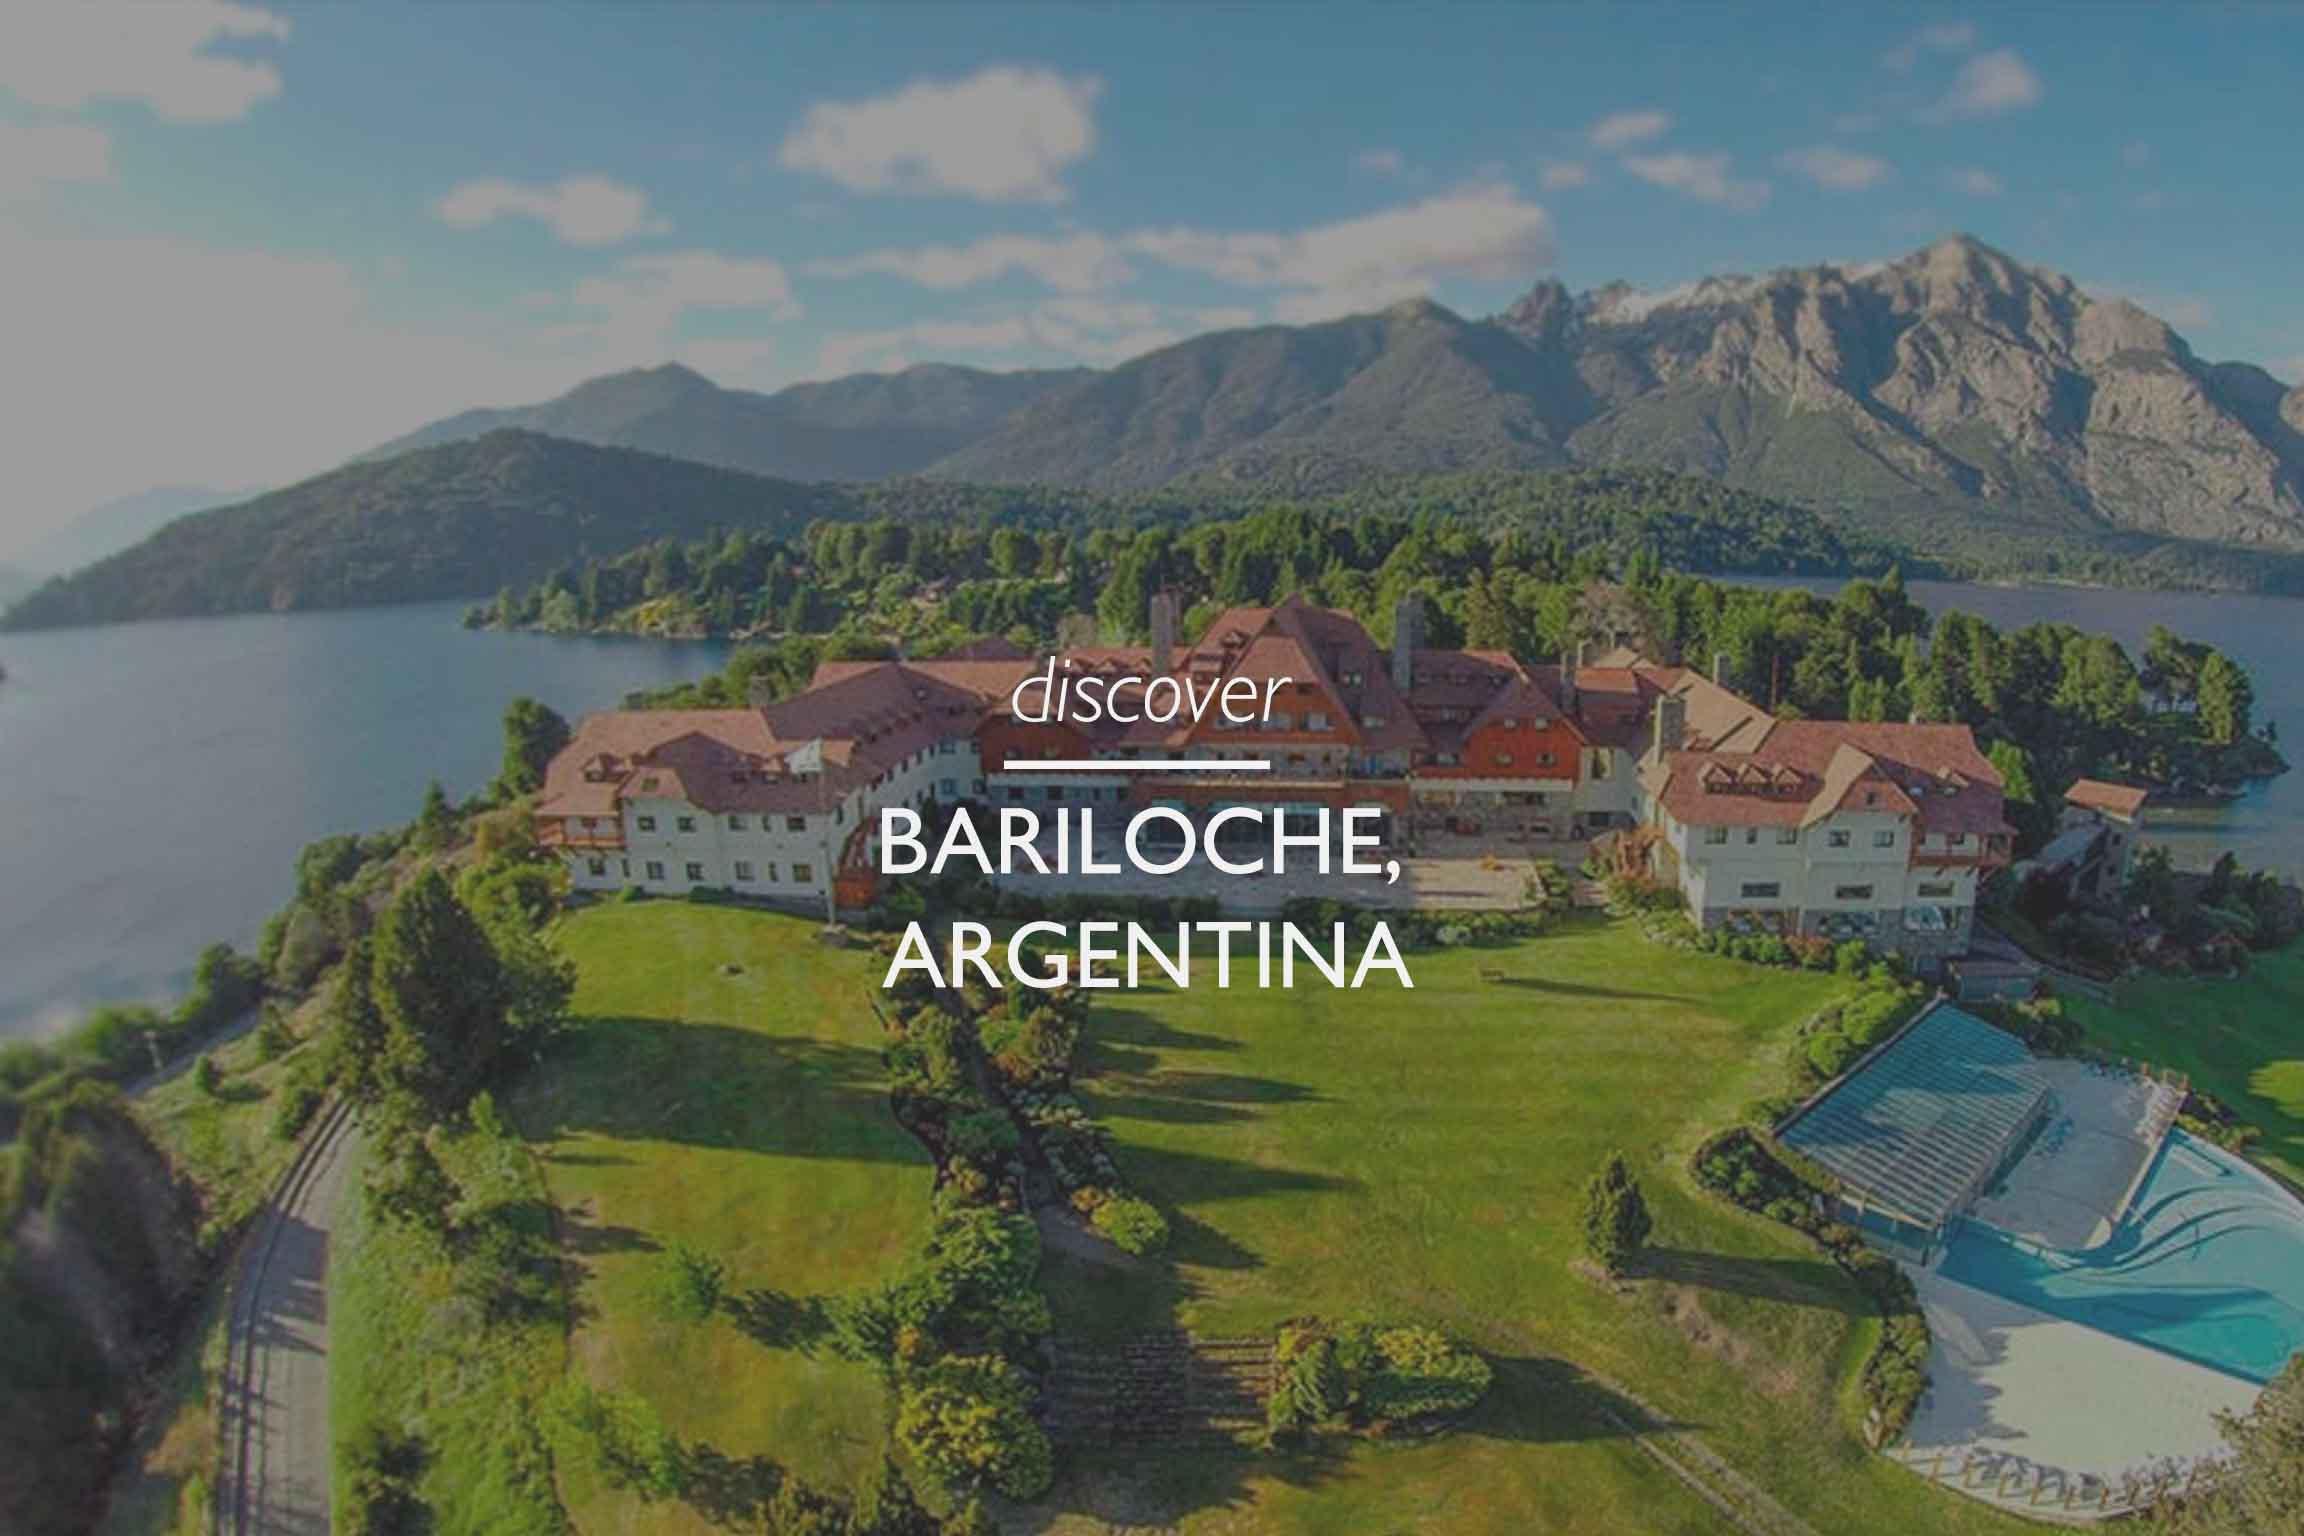 Wanderlist Discover Bariloche Argentina